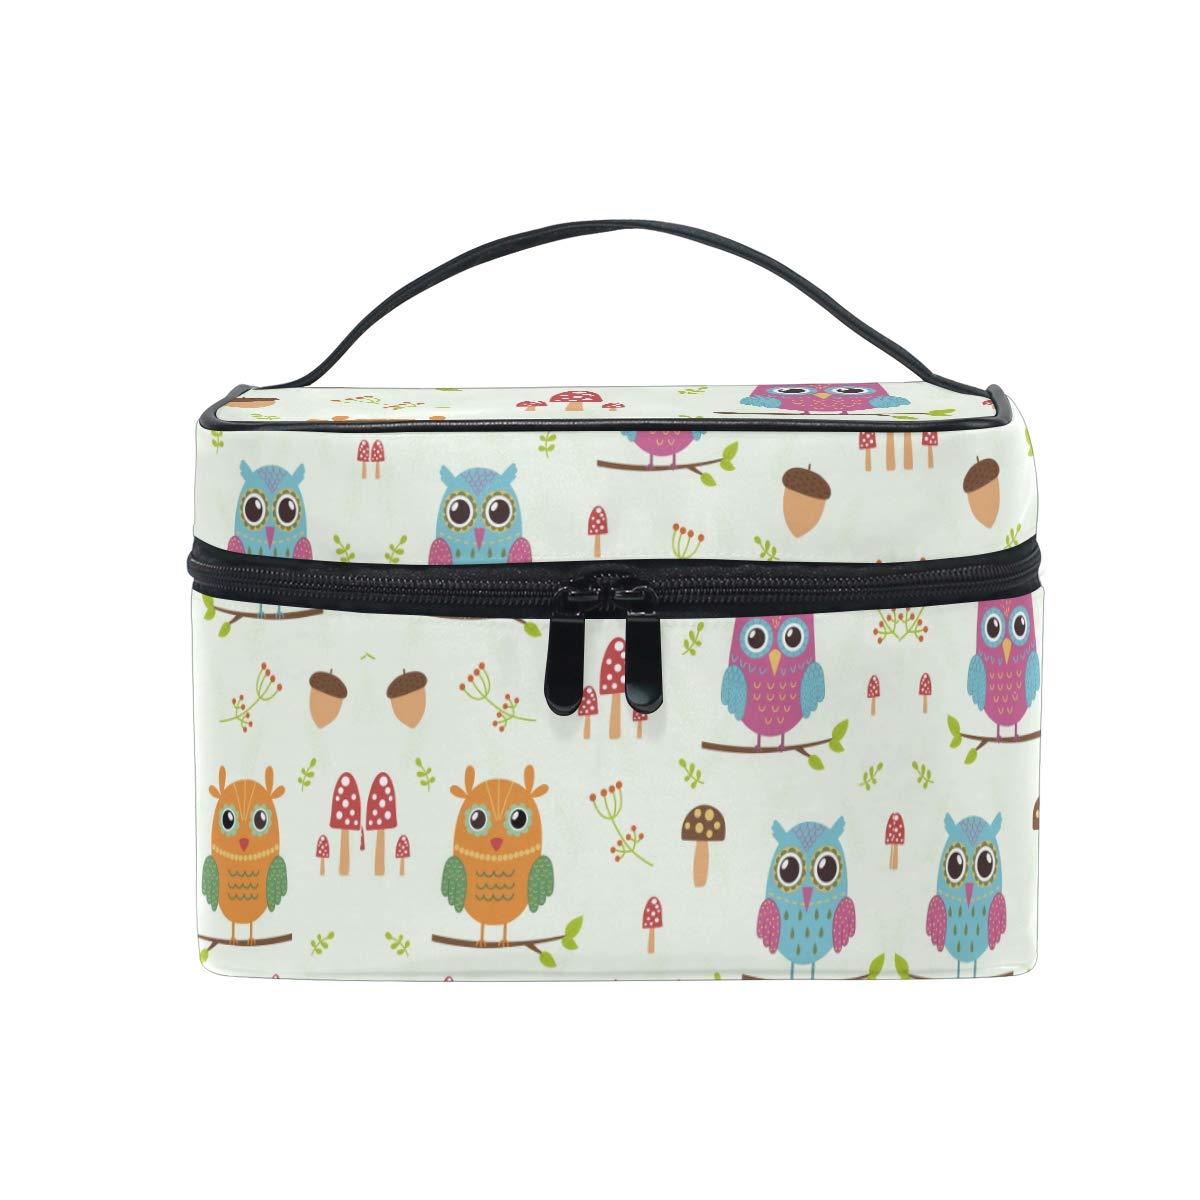 Daisy Owl Birds Cosmetic Bag Organizer Zipper Makeup Bags Pouch Toiletry Case for Girl Women